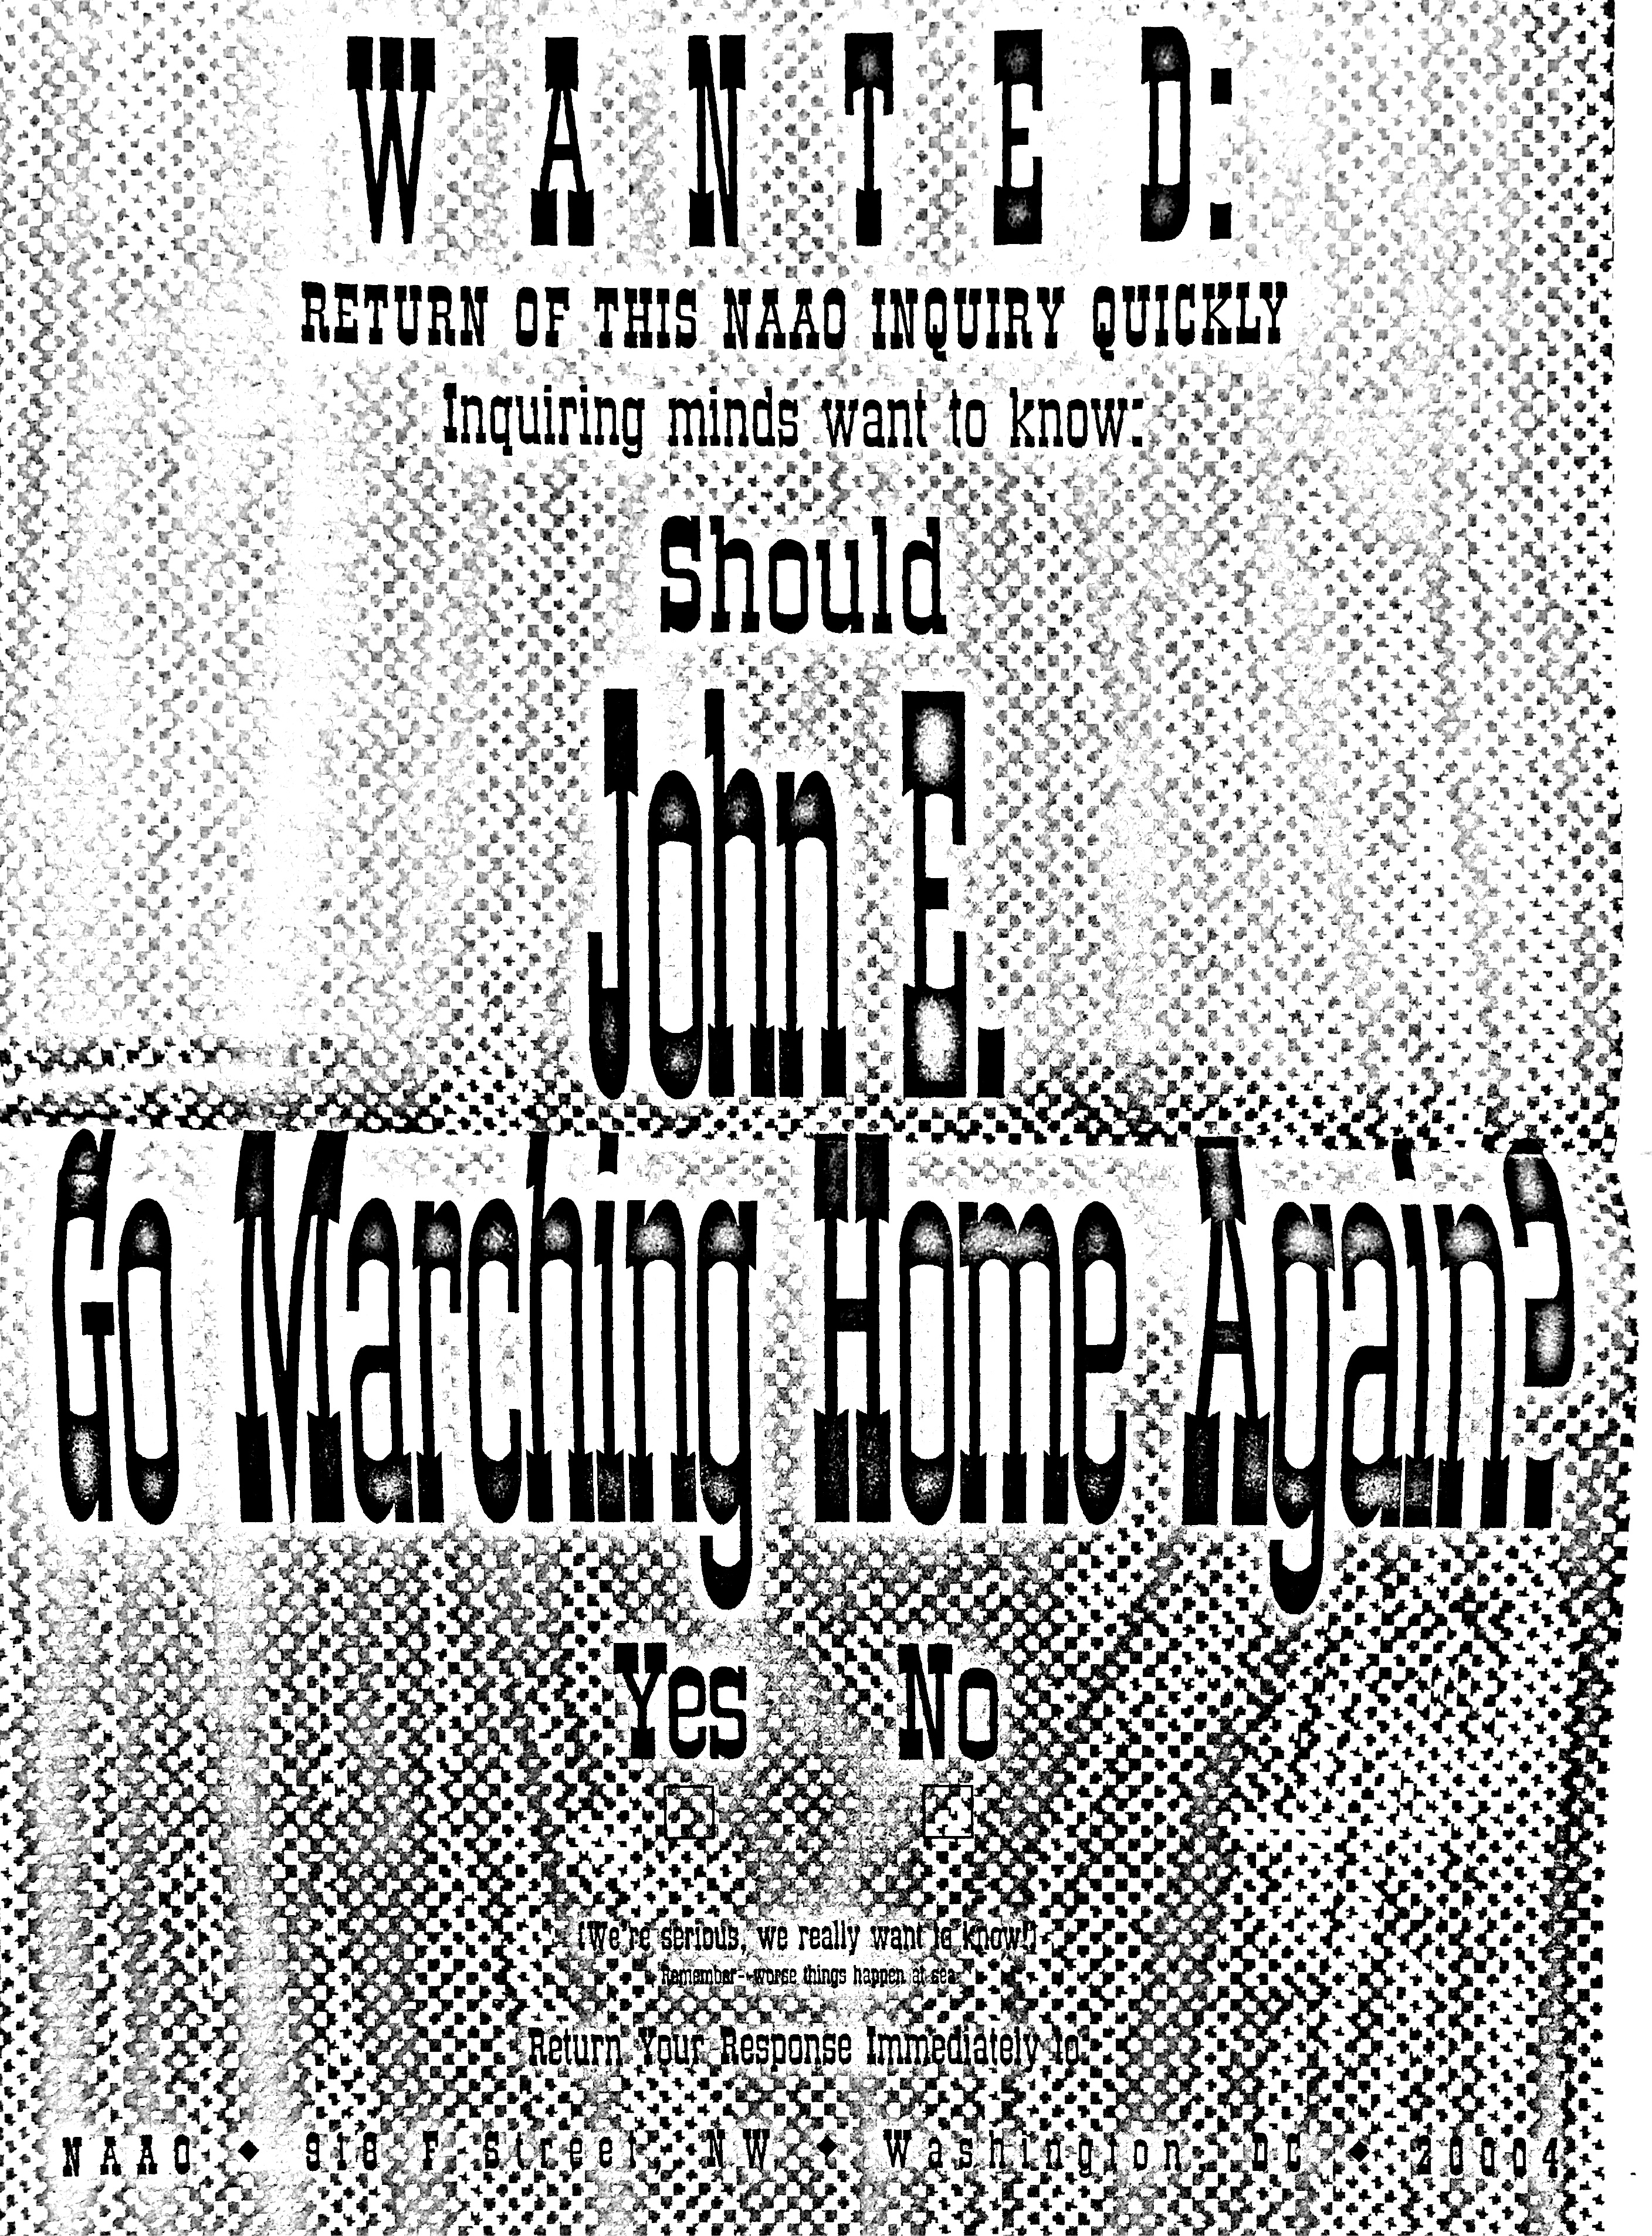 October 1990 - NAAO Bulletin Page 1.jpg